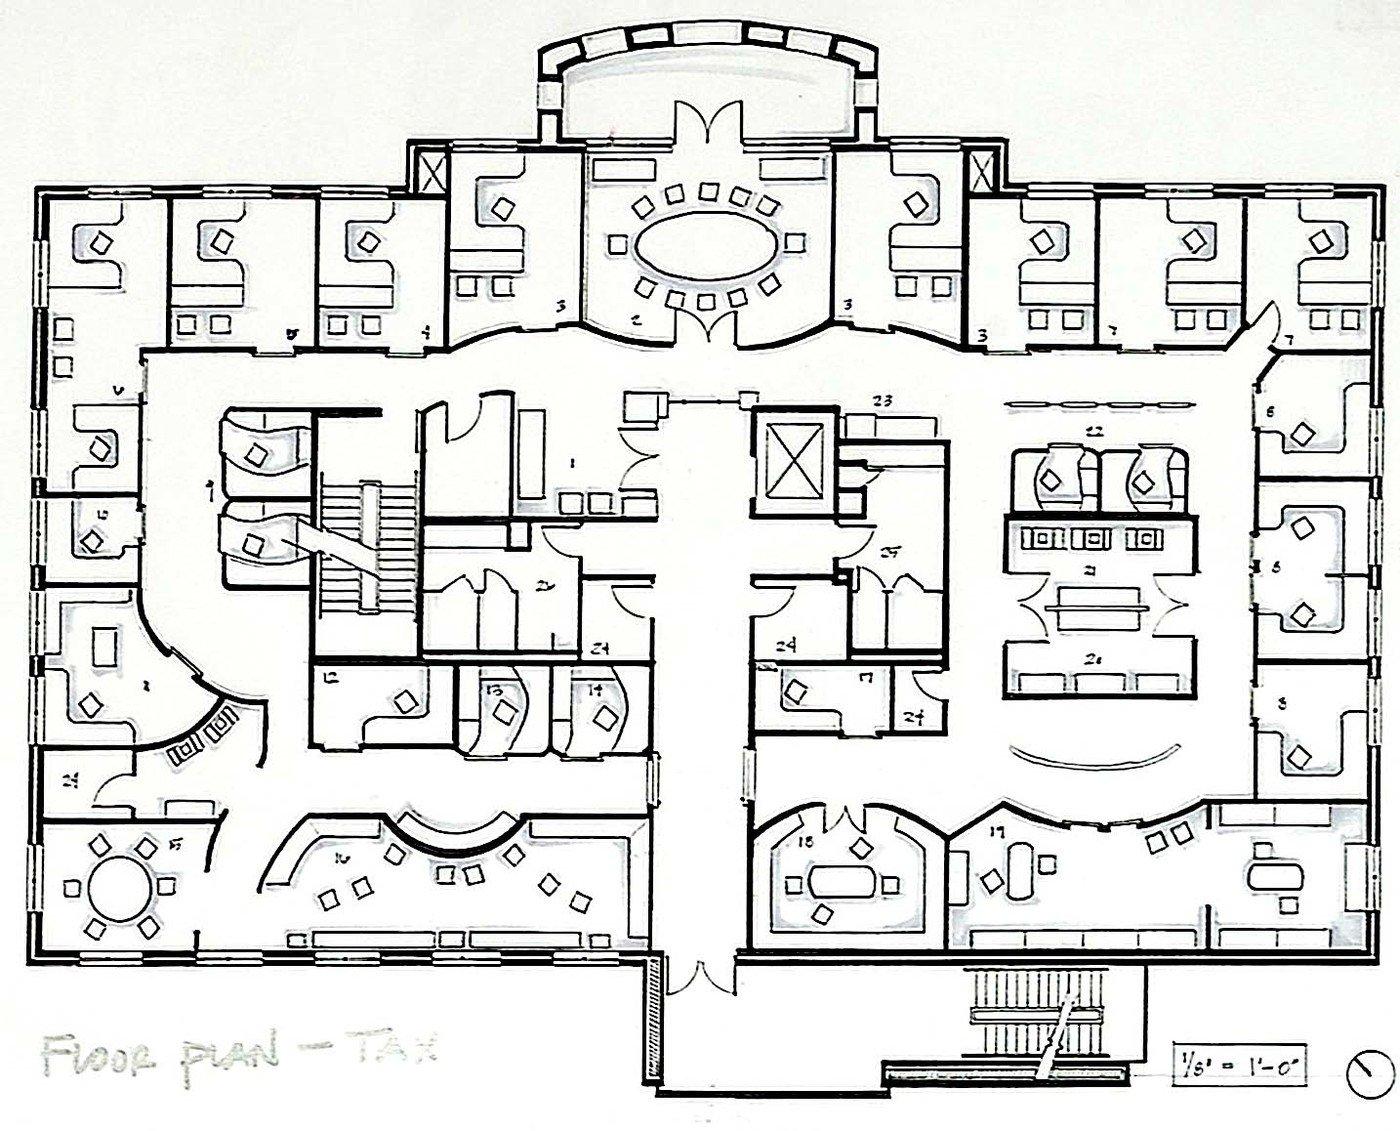 Floorplan Audits